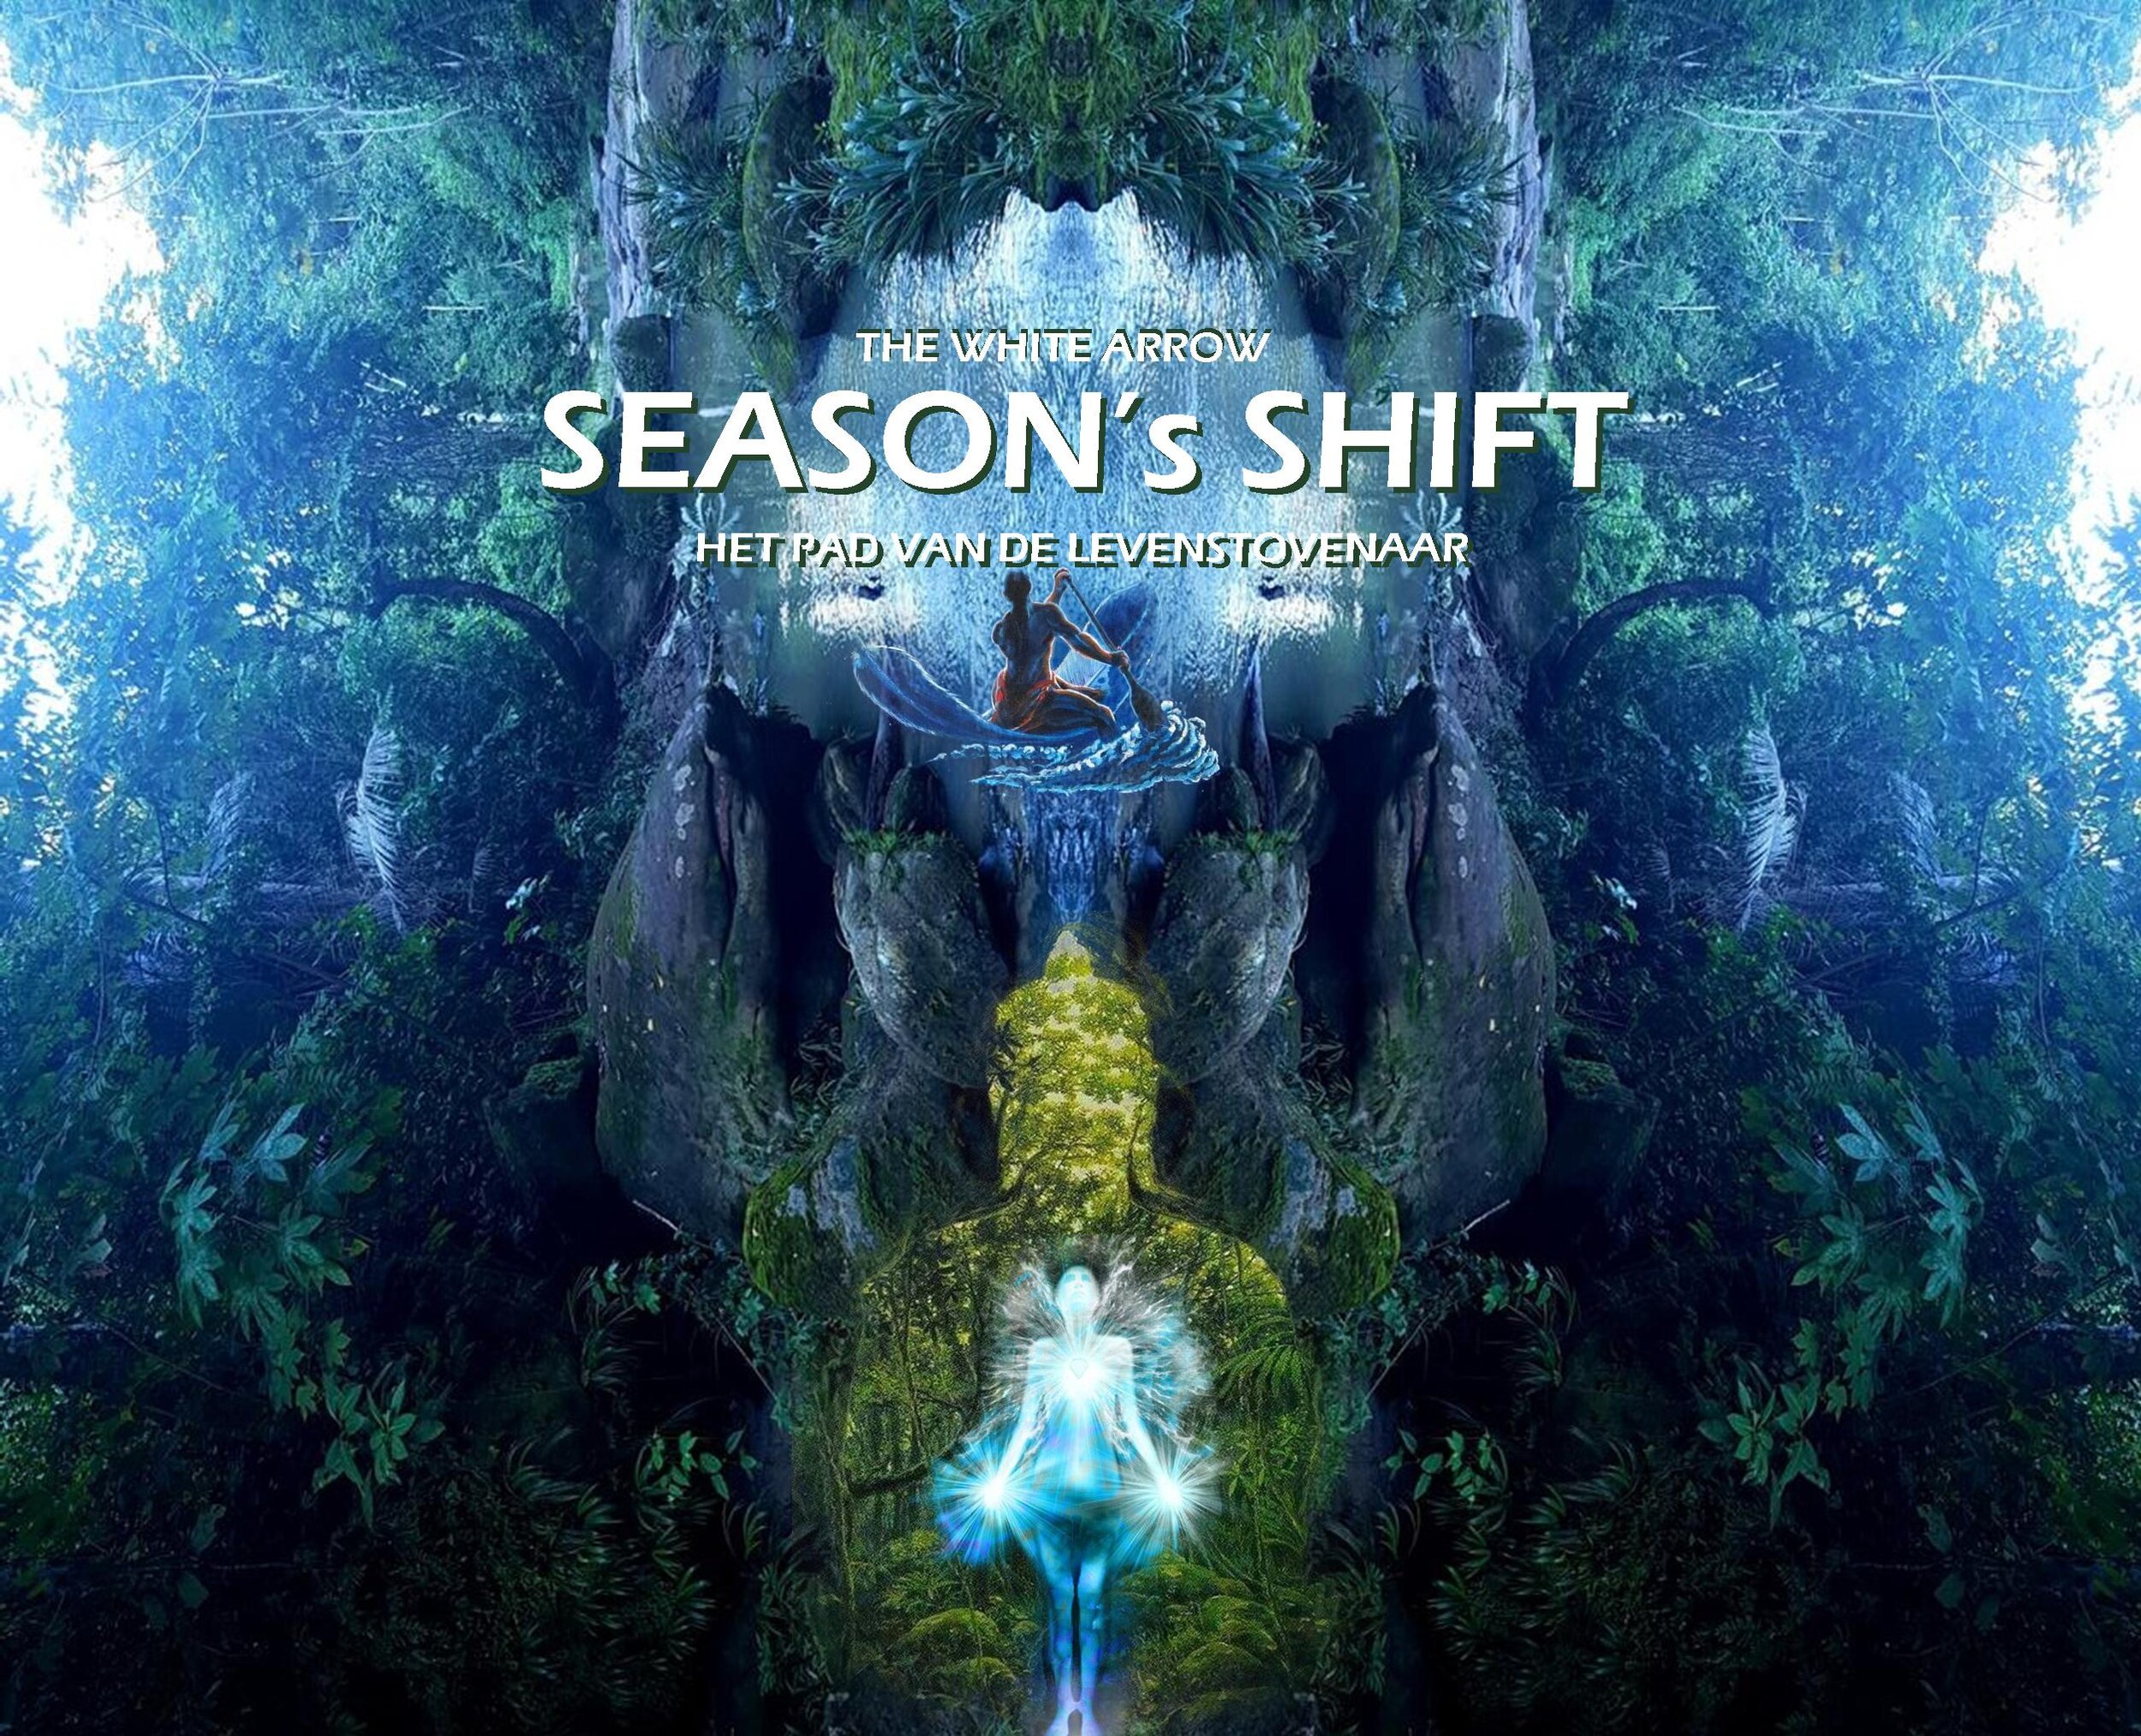 seasons shift affiche.jpg